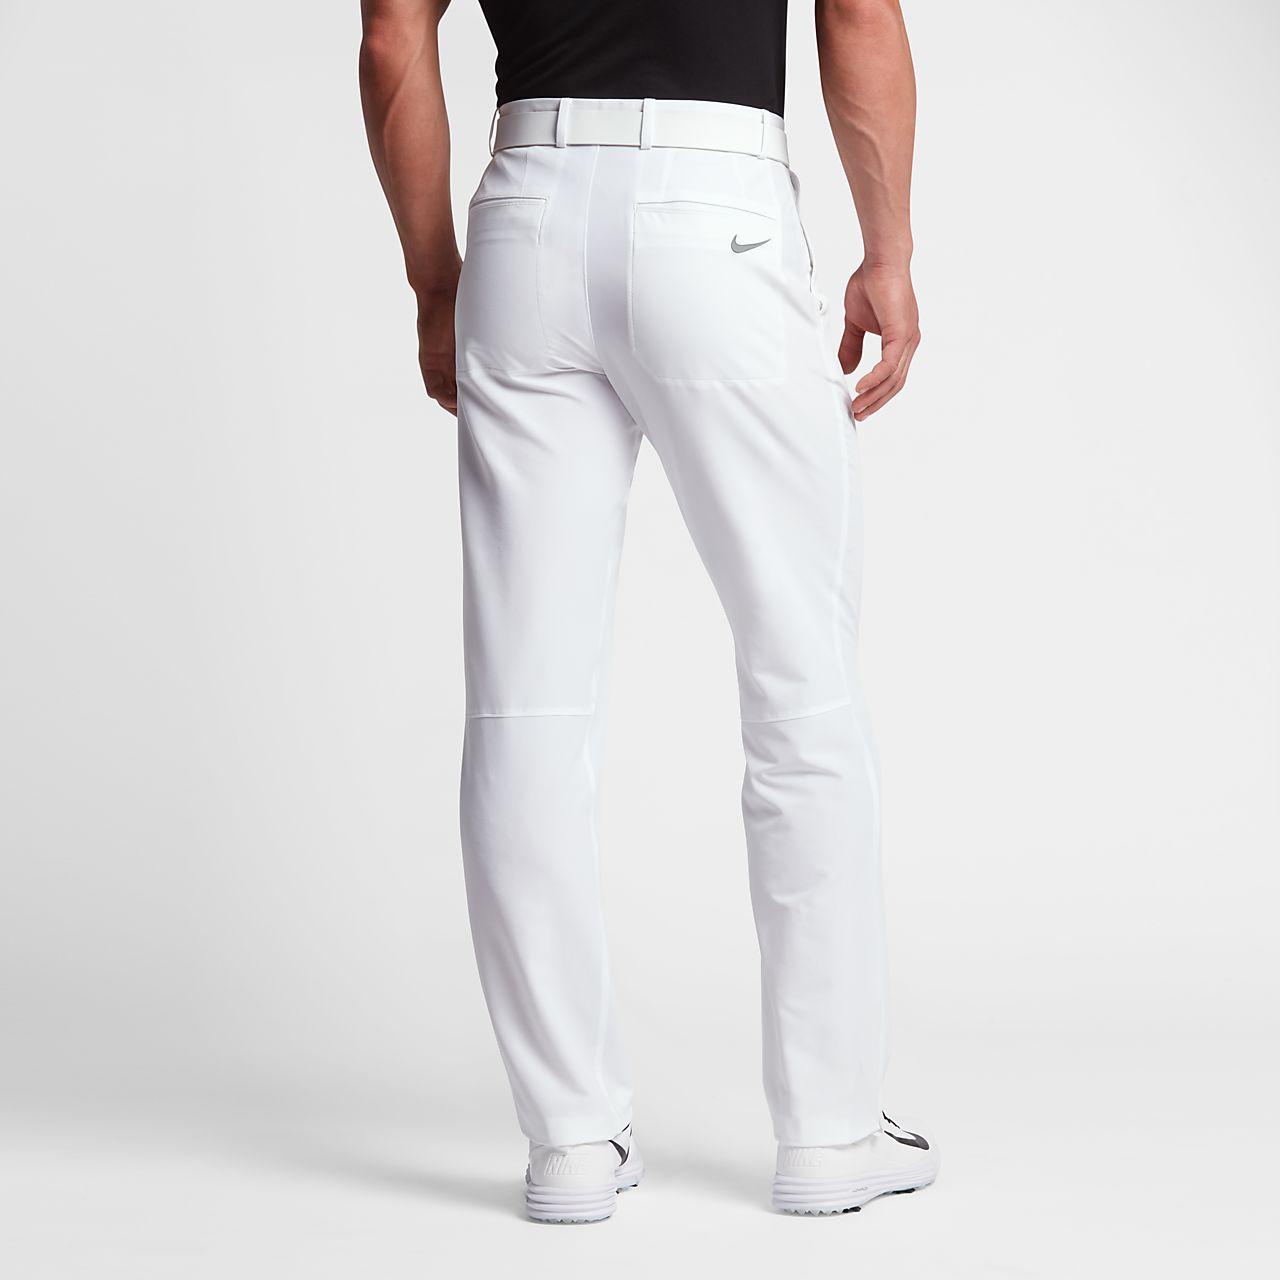 Nike Flex Hybrid Men Woven Golf Trousers